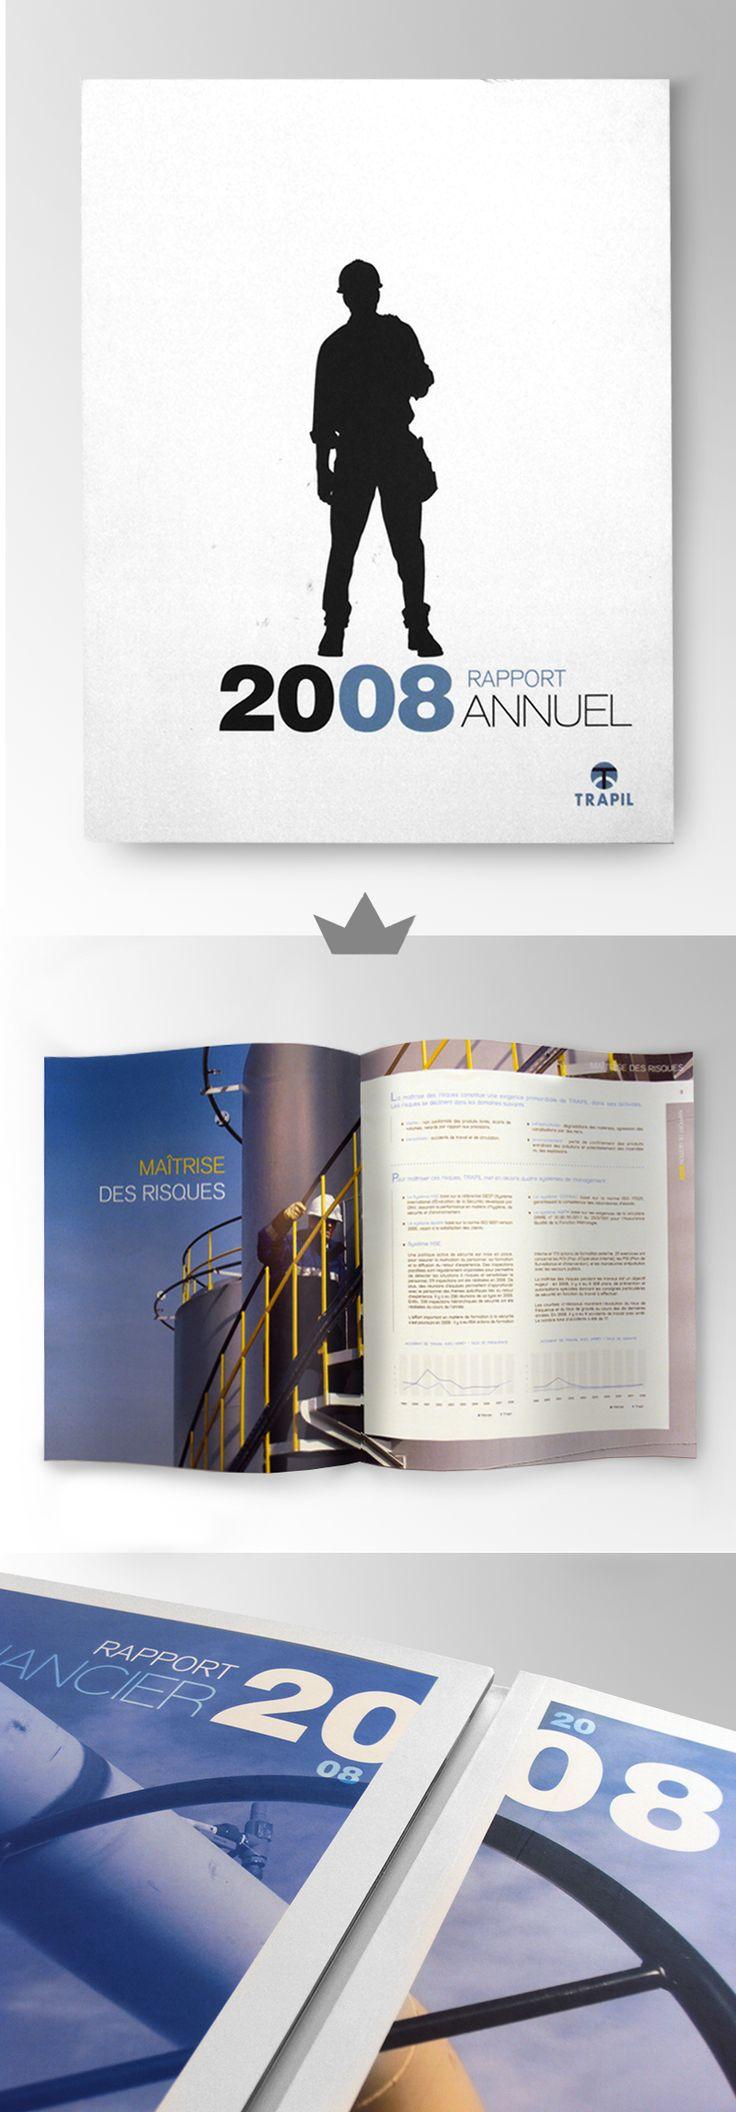 TRAPIL - Rapport annuel 2008